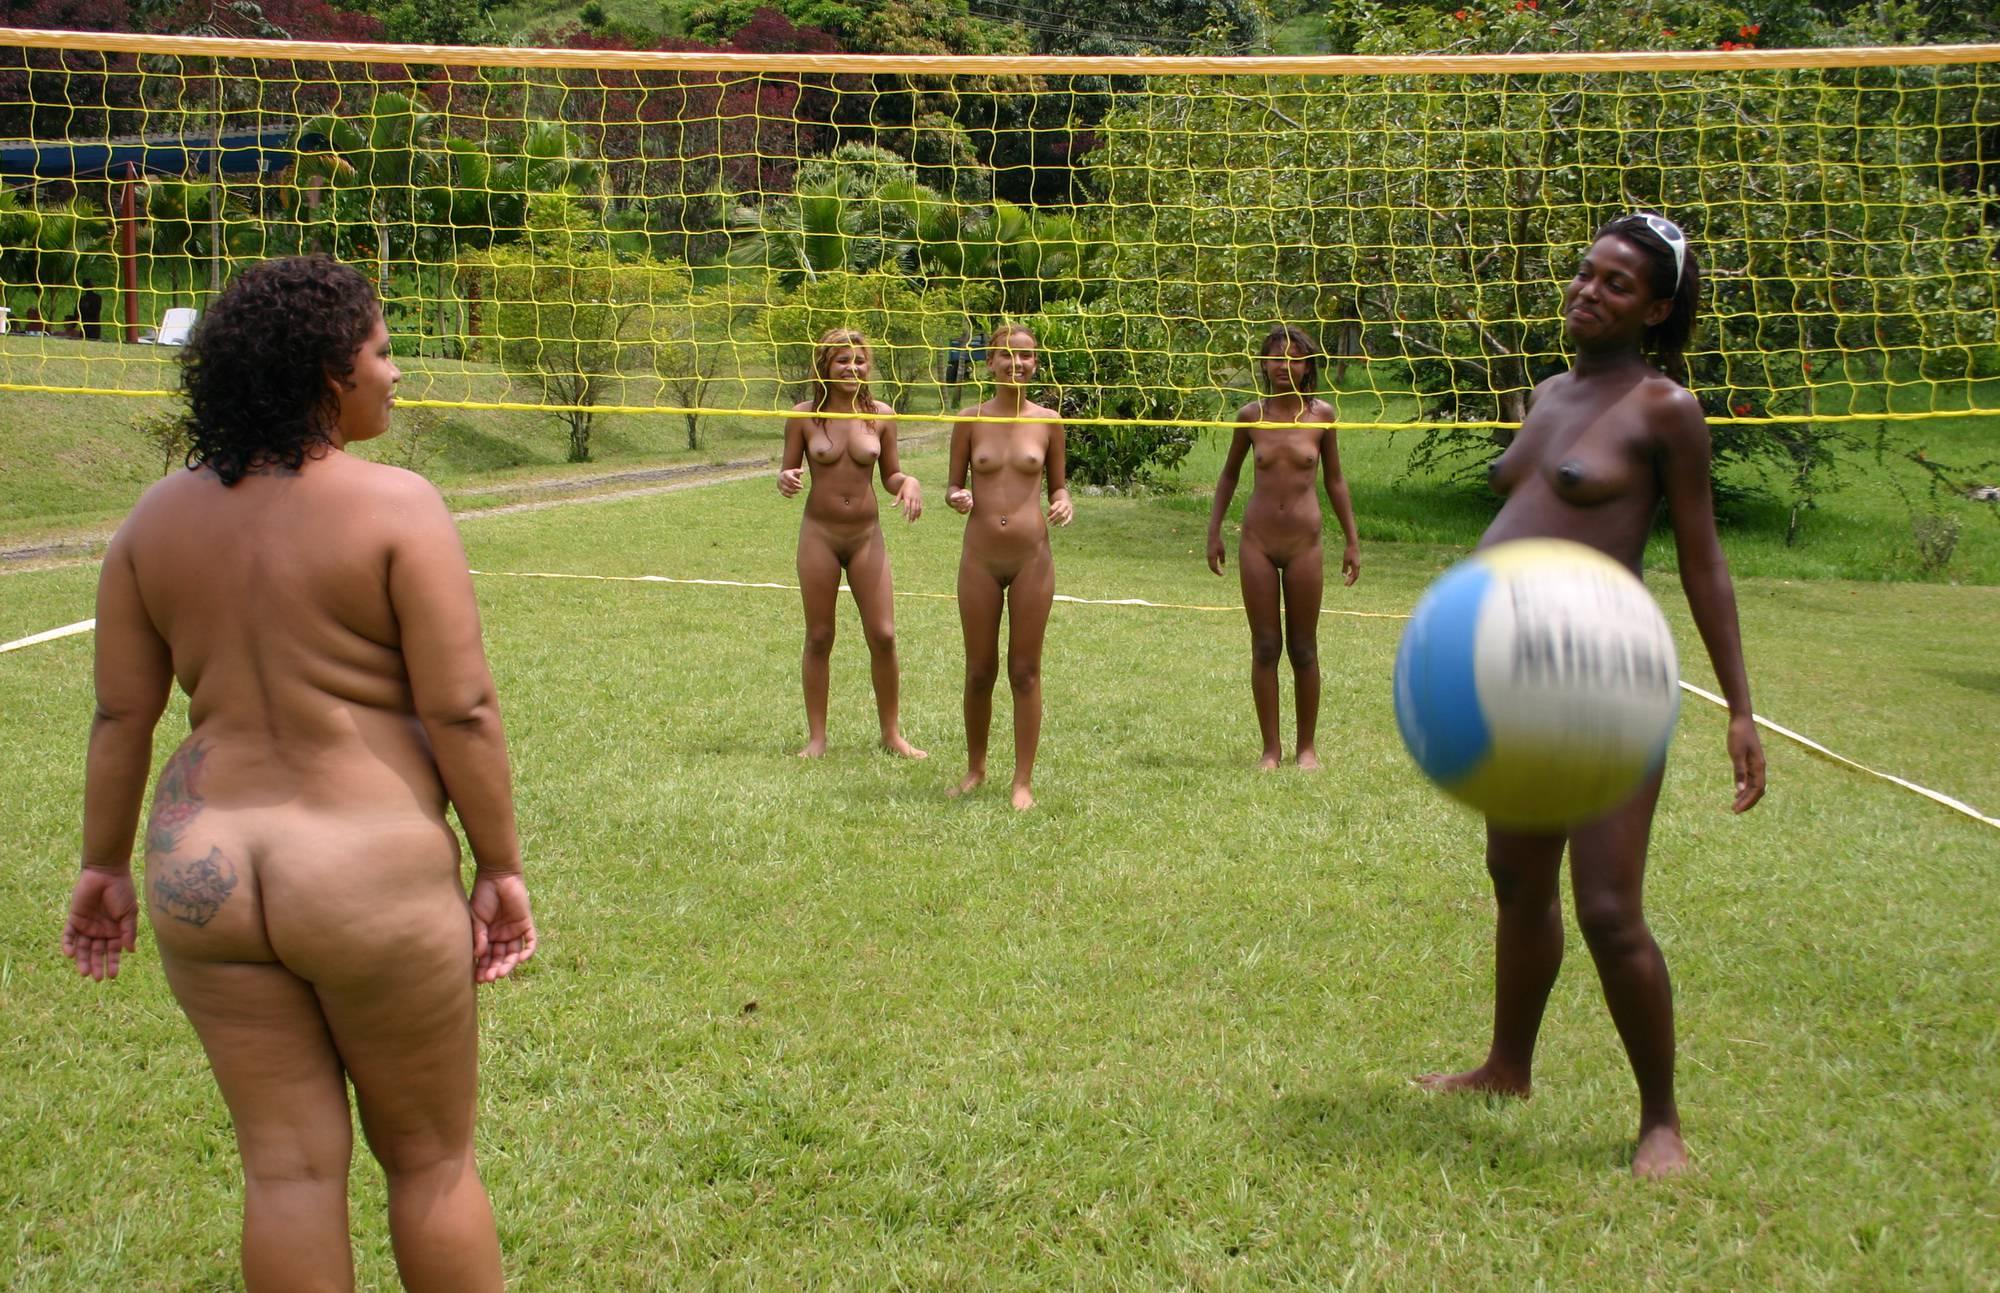 Purenudism Pics-Brazilian Outdoor Sports - 2